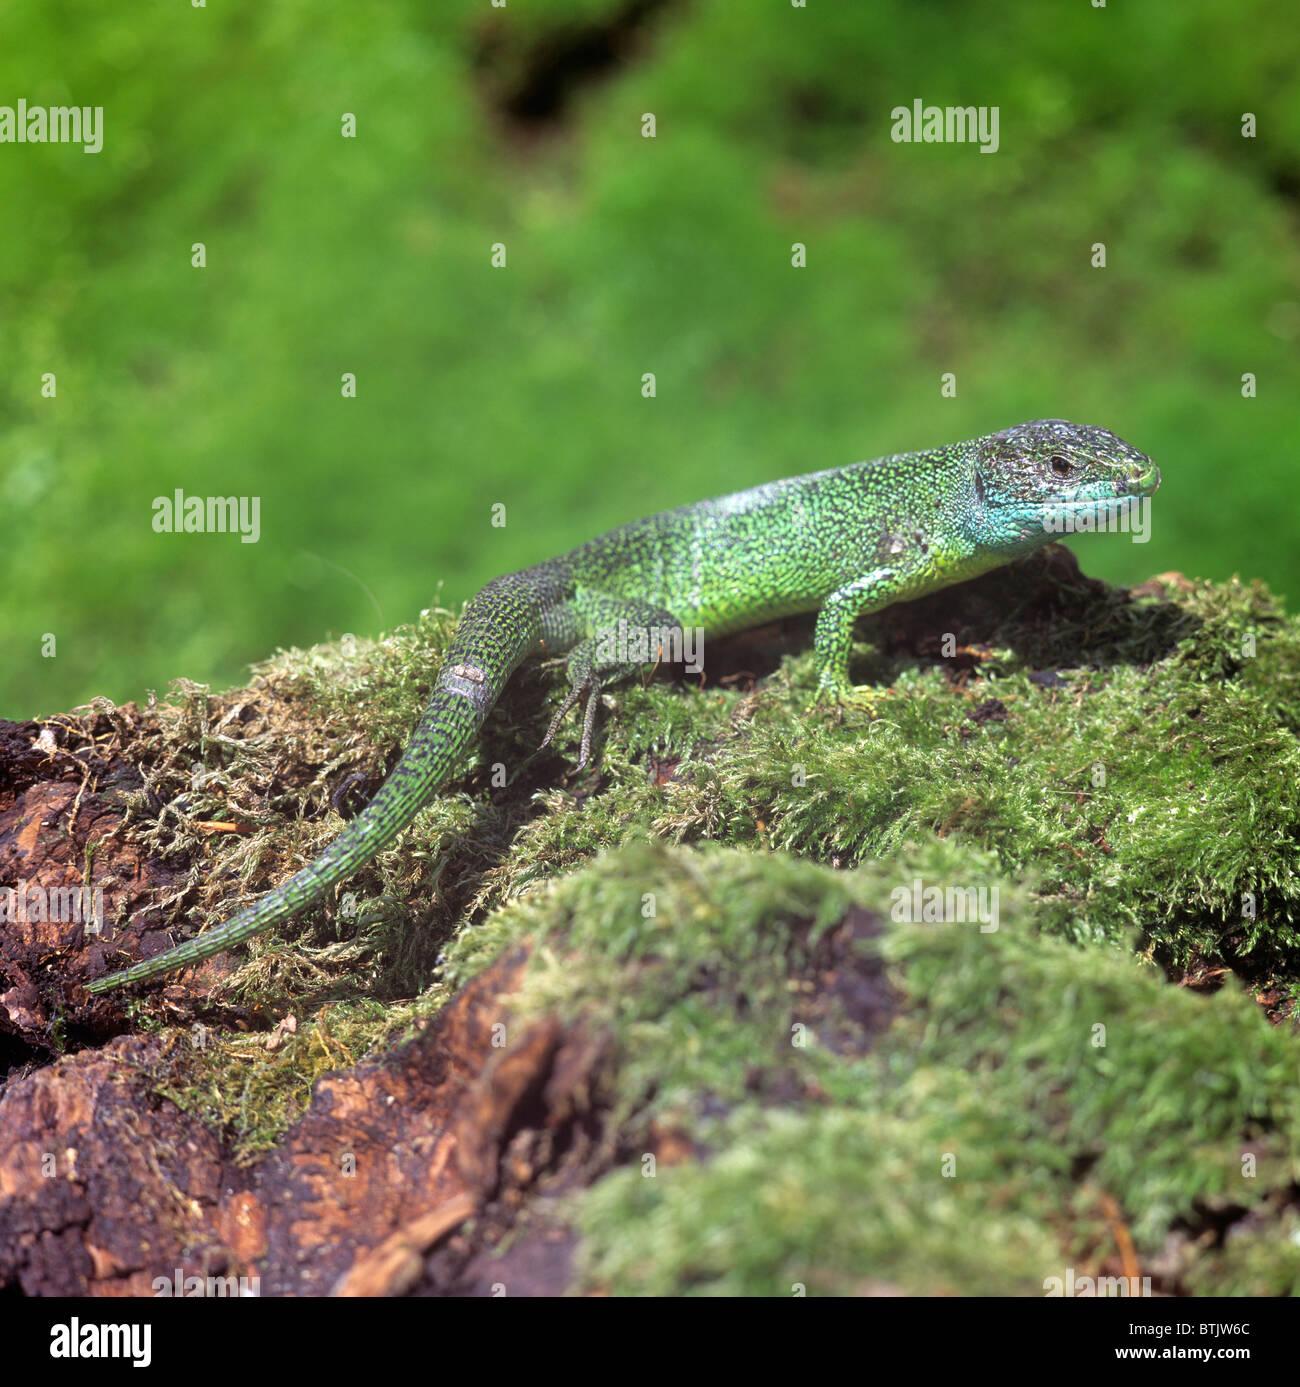 European Green Lizard (Lacerta viridis), male on mossy log. - Stock Image